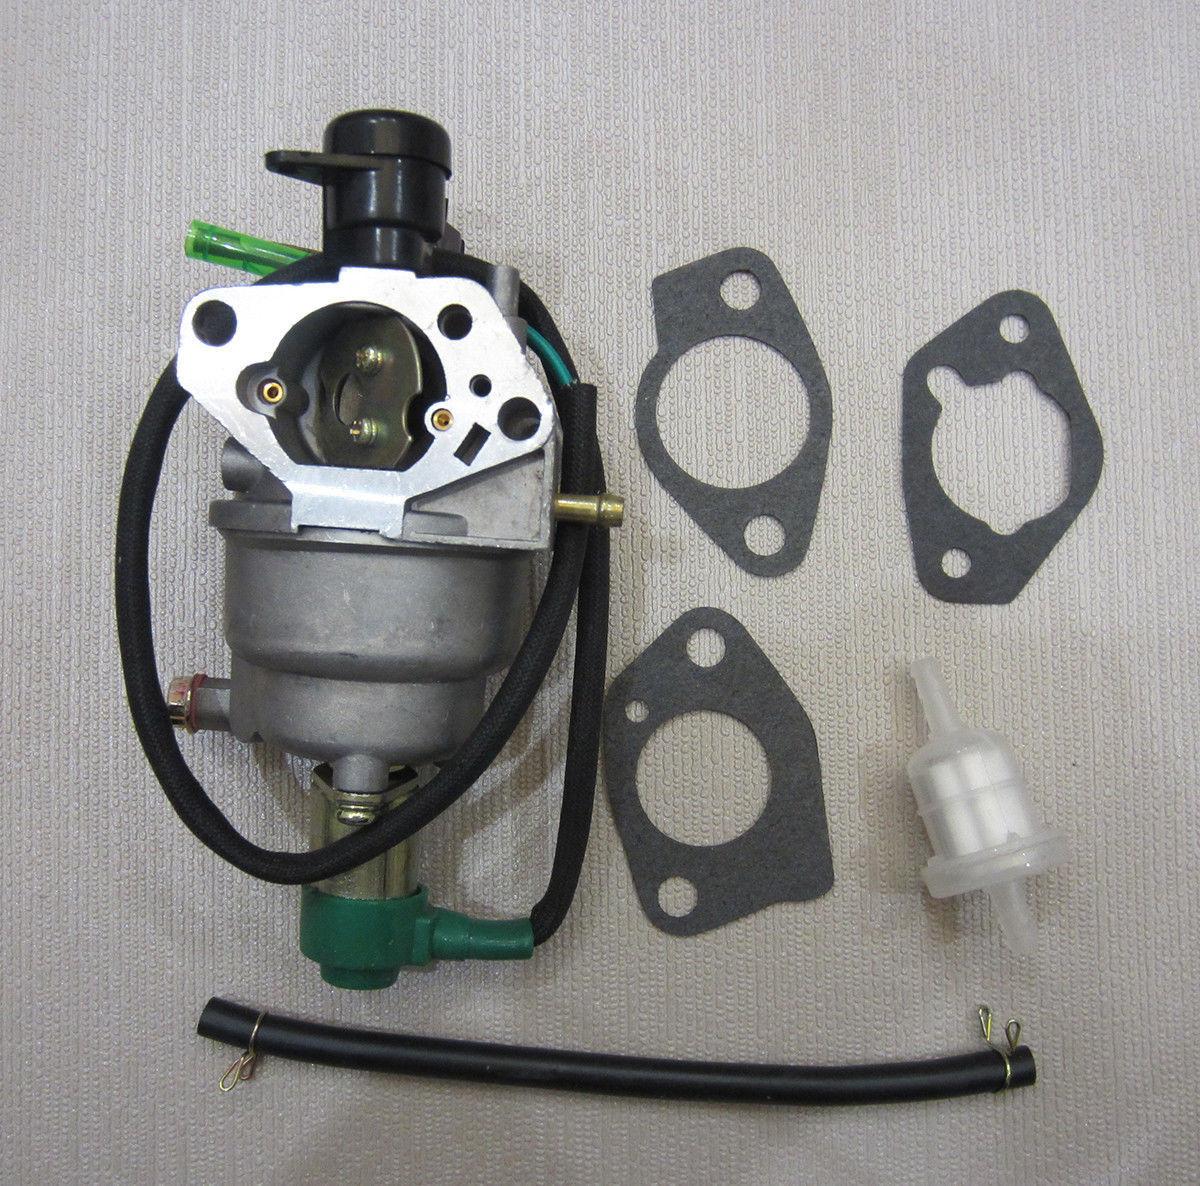 Used, Generator Carburetor For Generac Centurion GP5000 5944 0055770 005577-1 005578-0 for sale  USA